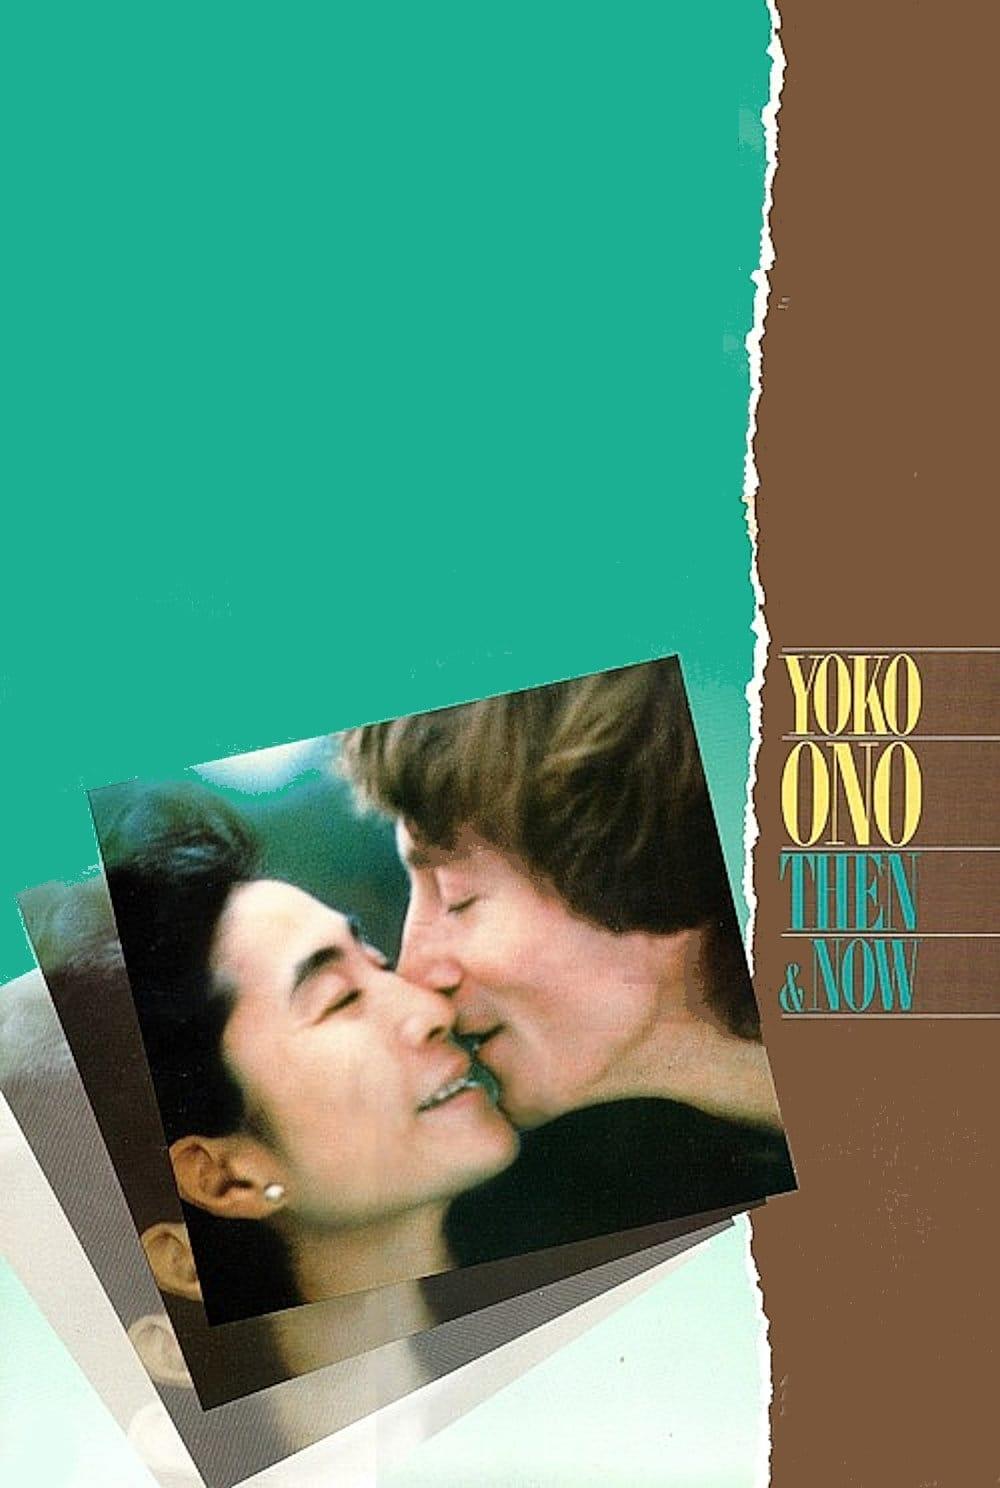 Yoko Ono: Then and Now